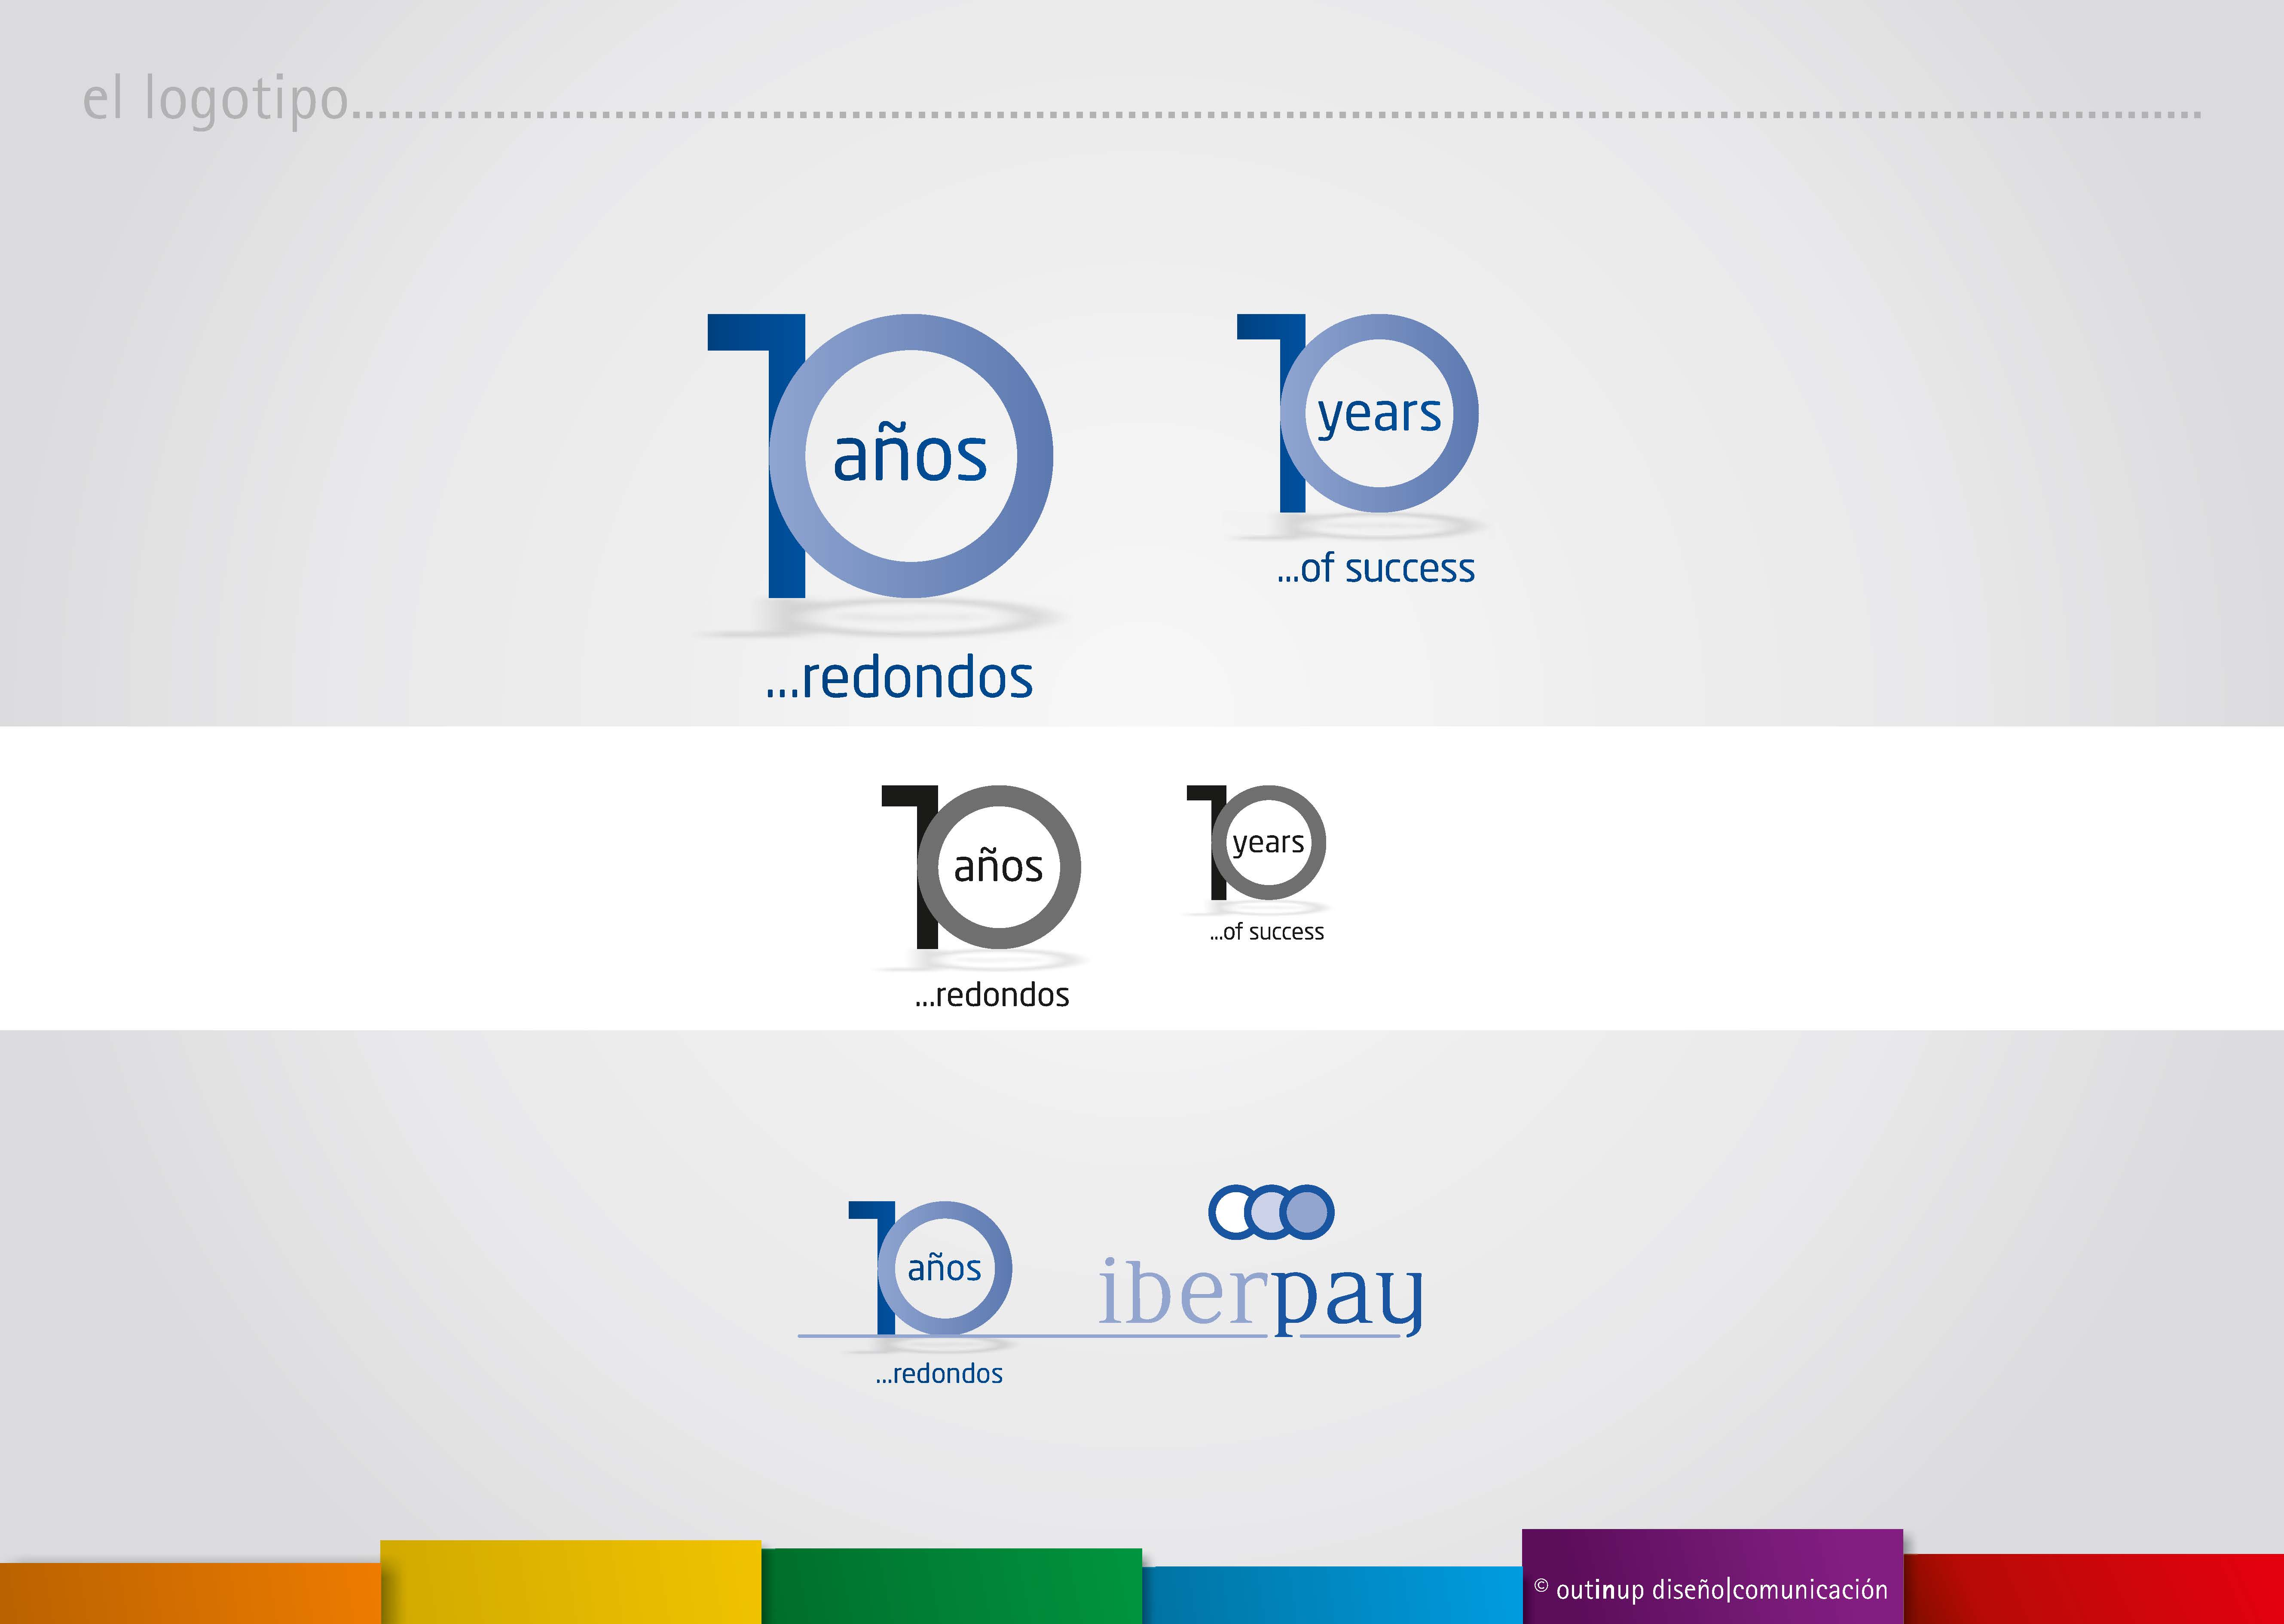 IC_Logo_IBERPAY_LOGO_10_AÑOS_(1).jpg